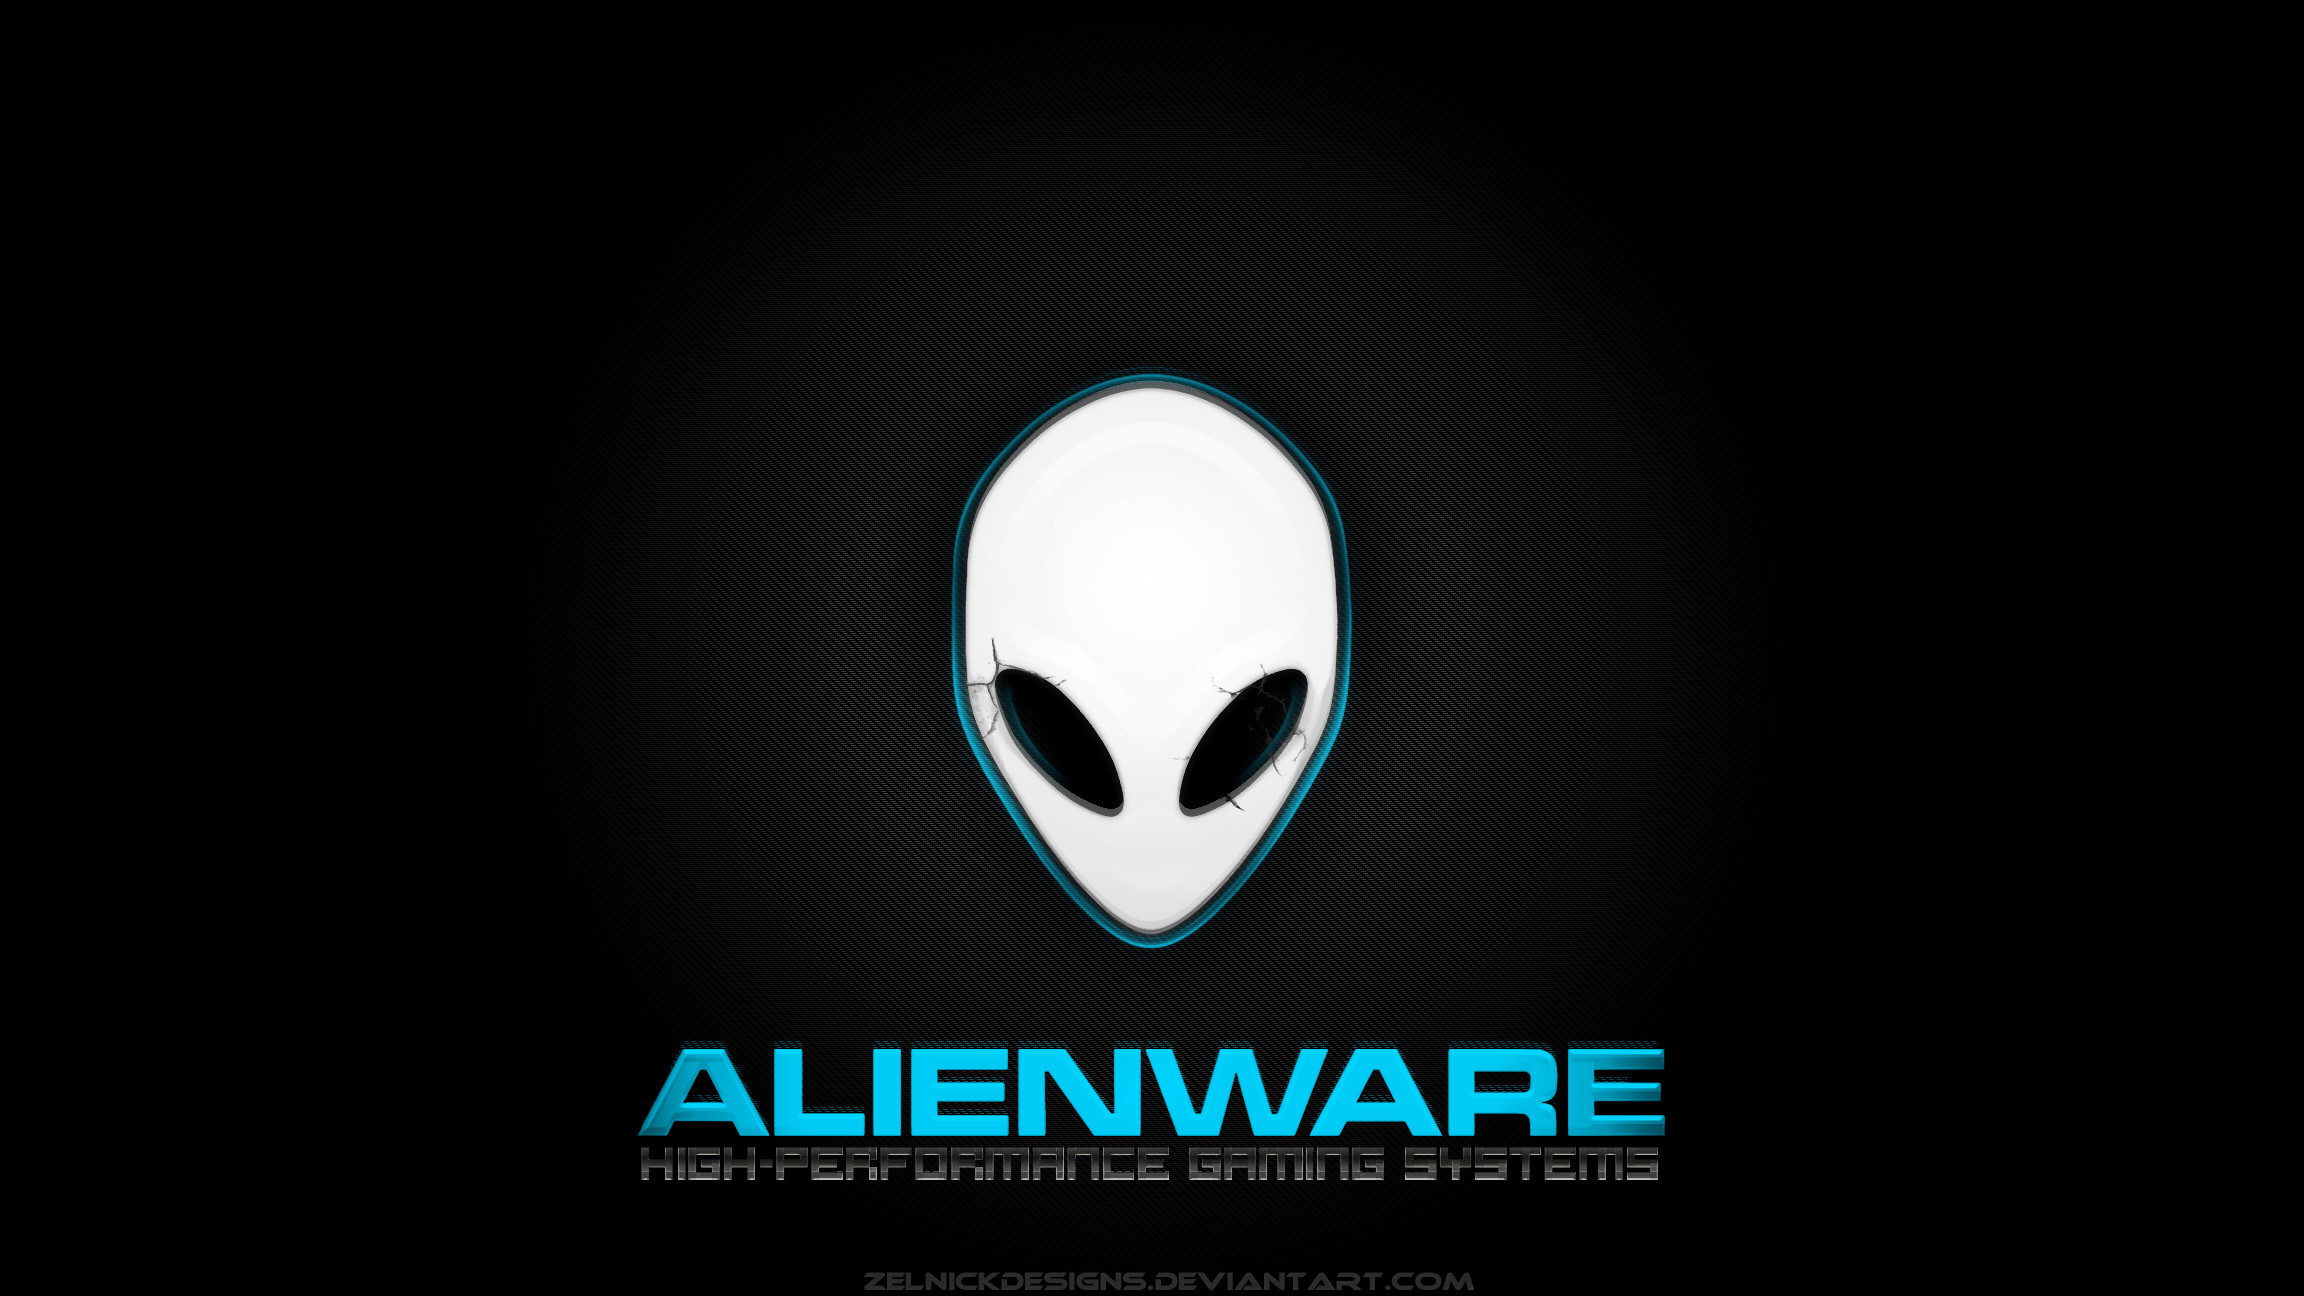 Alienware red wallpaper 74 images 1920x1080 alienware desktop backgrounds alienware fx themes voltagebd Choice Image